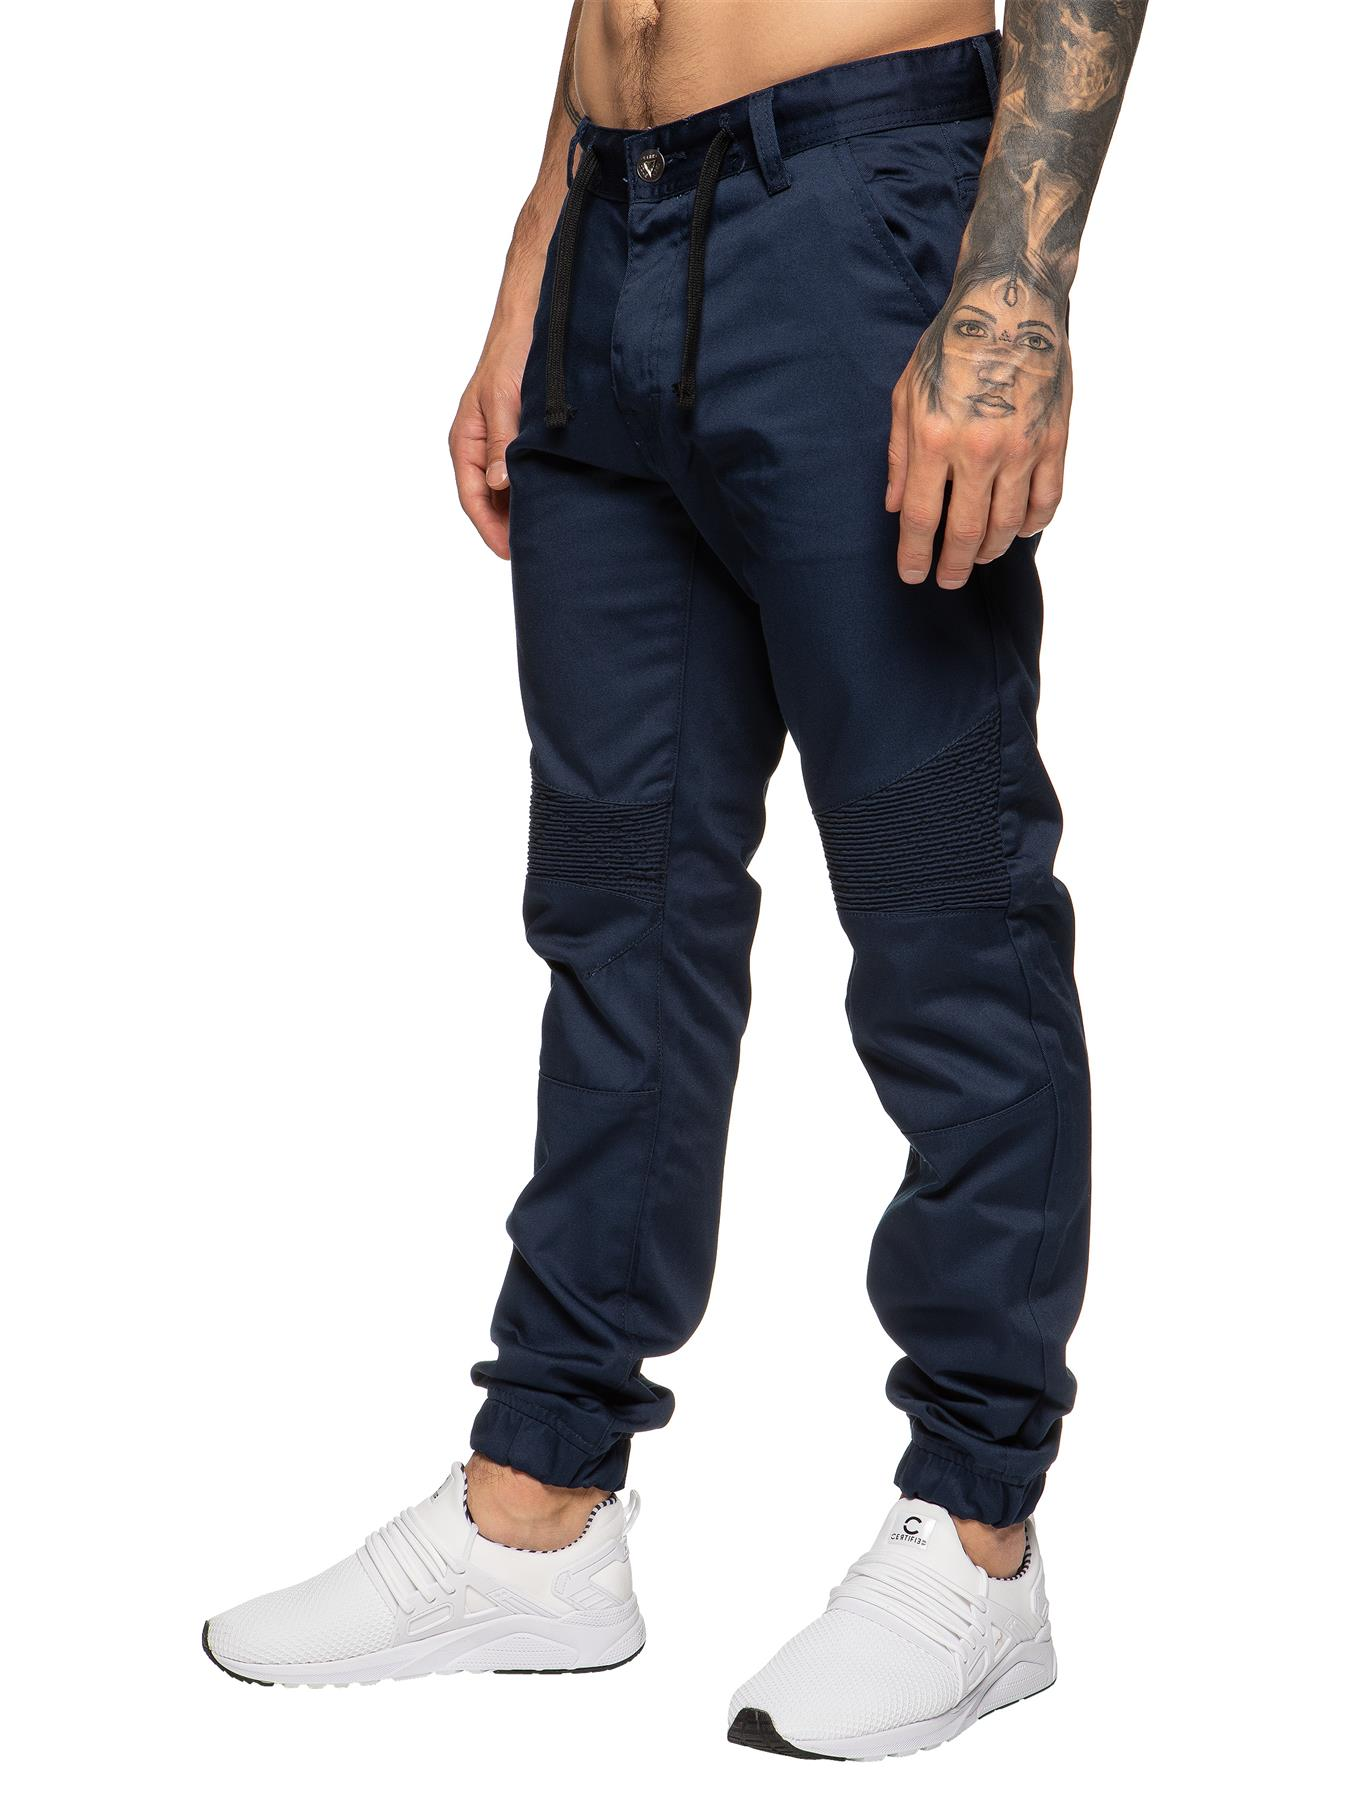 Nouvelle hommes enzo chino Basic Stretch Slim Jeans Pantalon Pantalon Taille Tailles S1